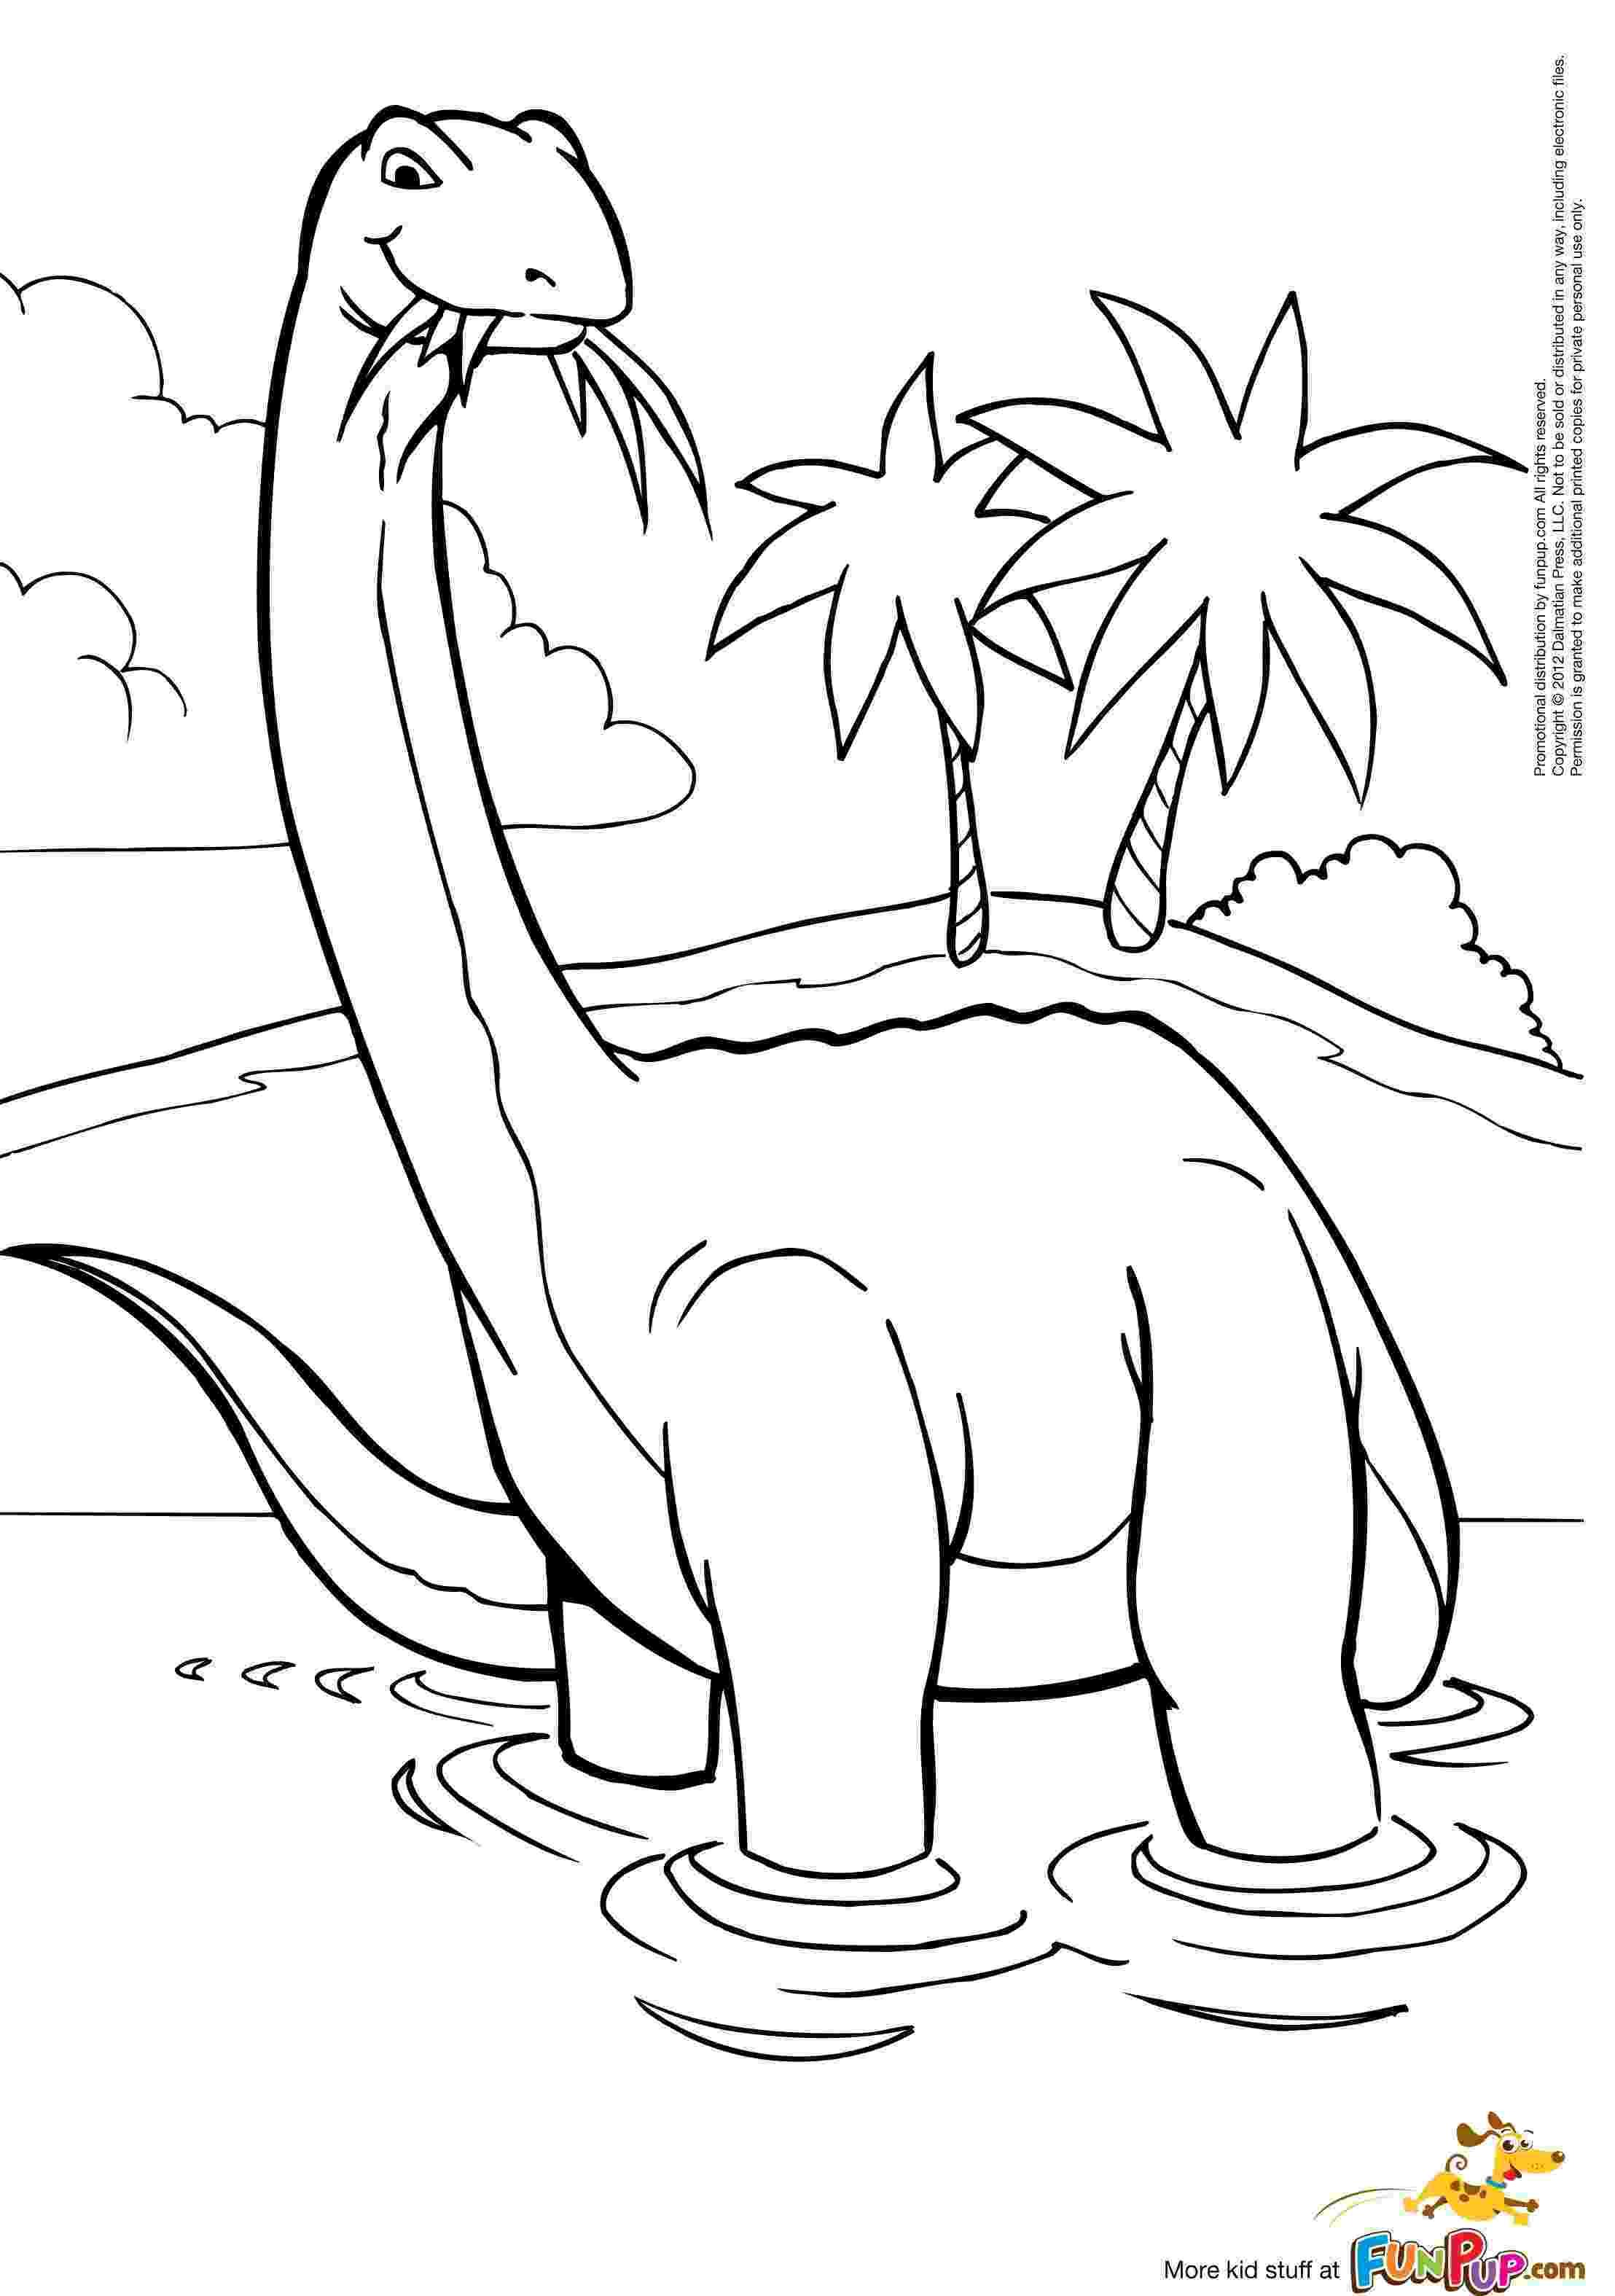 brontosaurus coloring page brontosaurus coloring pages getcoloringpagescom brontosaurus coloring page